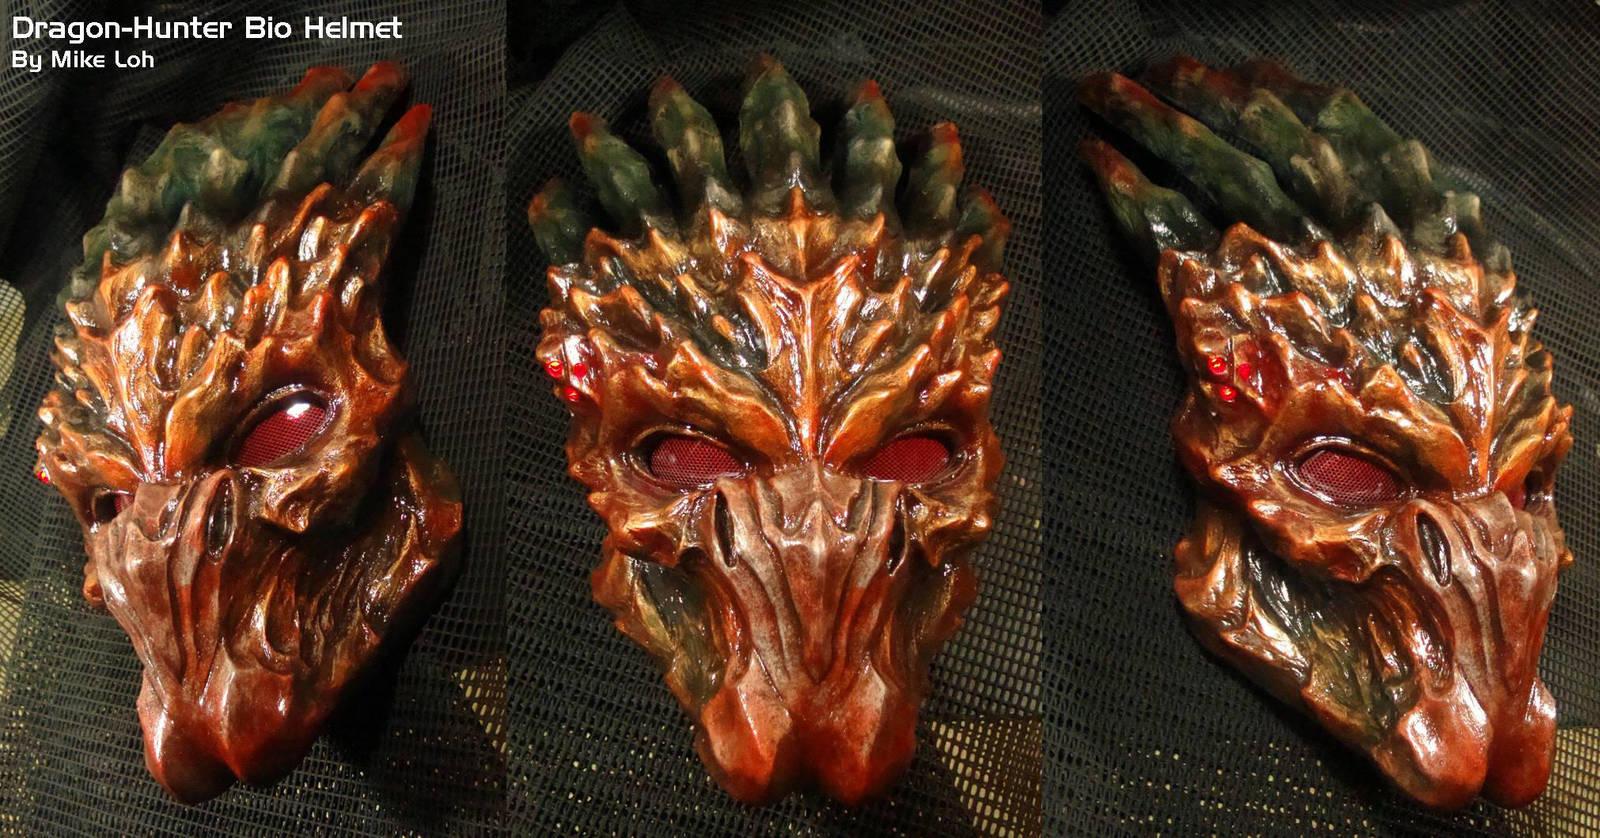 Dragon hunter gift by uratz studios on deviantart - Uratz studios ...